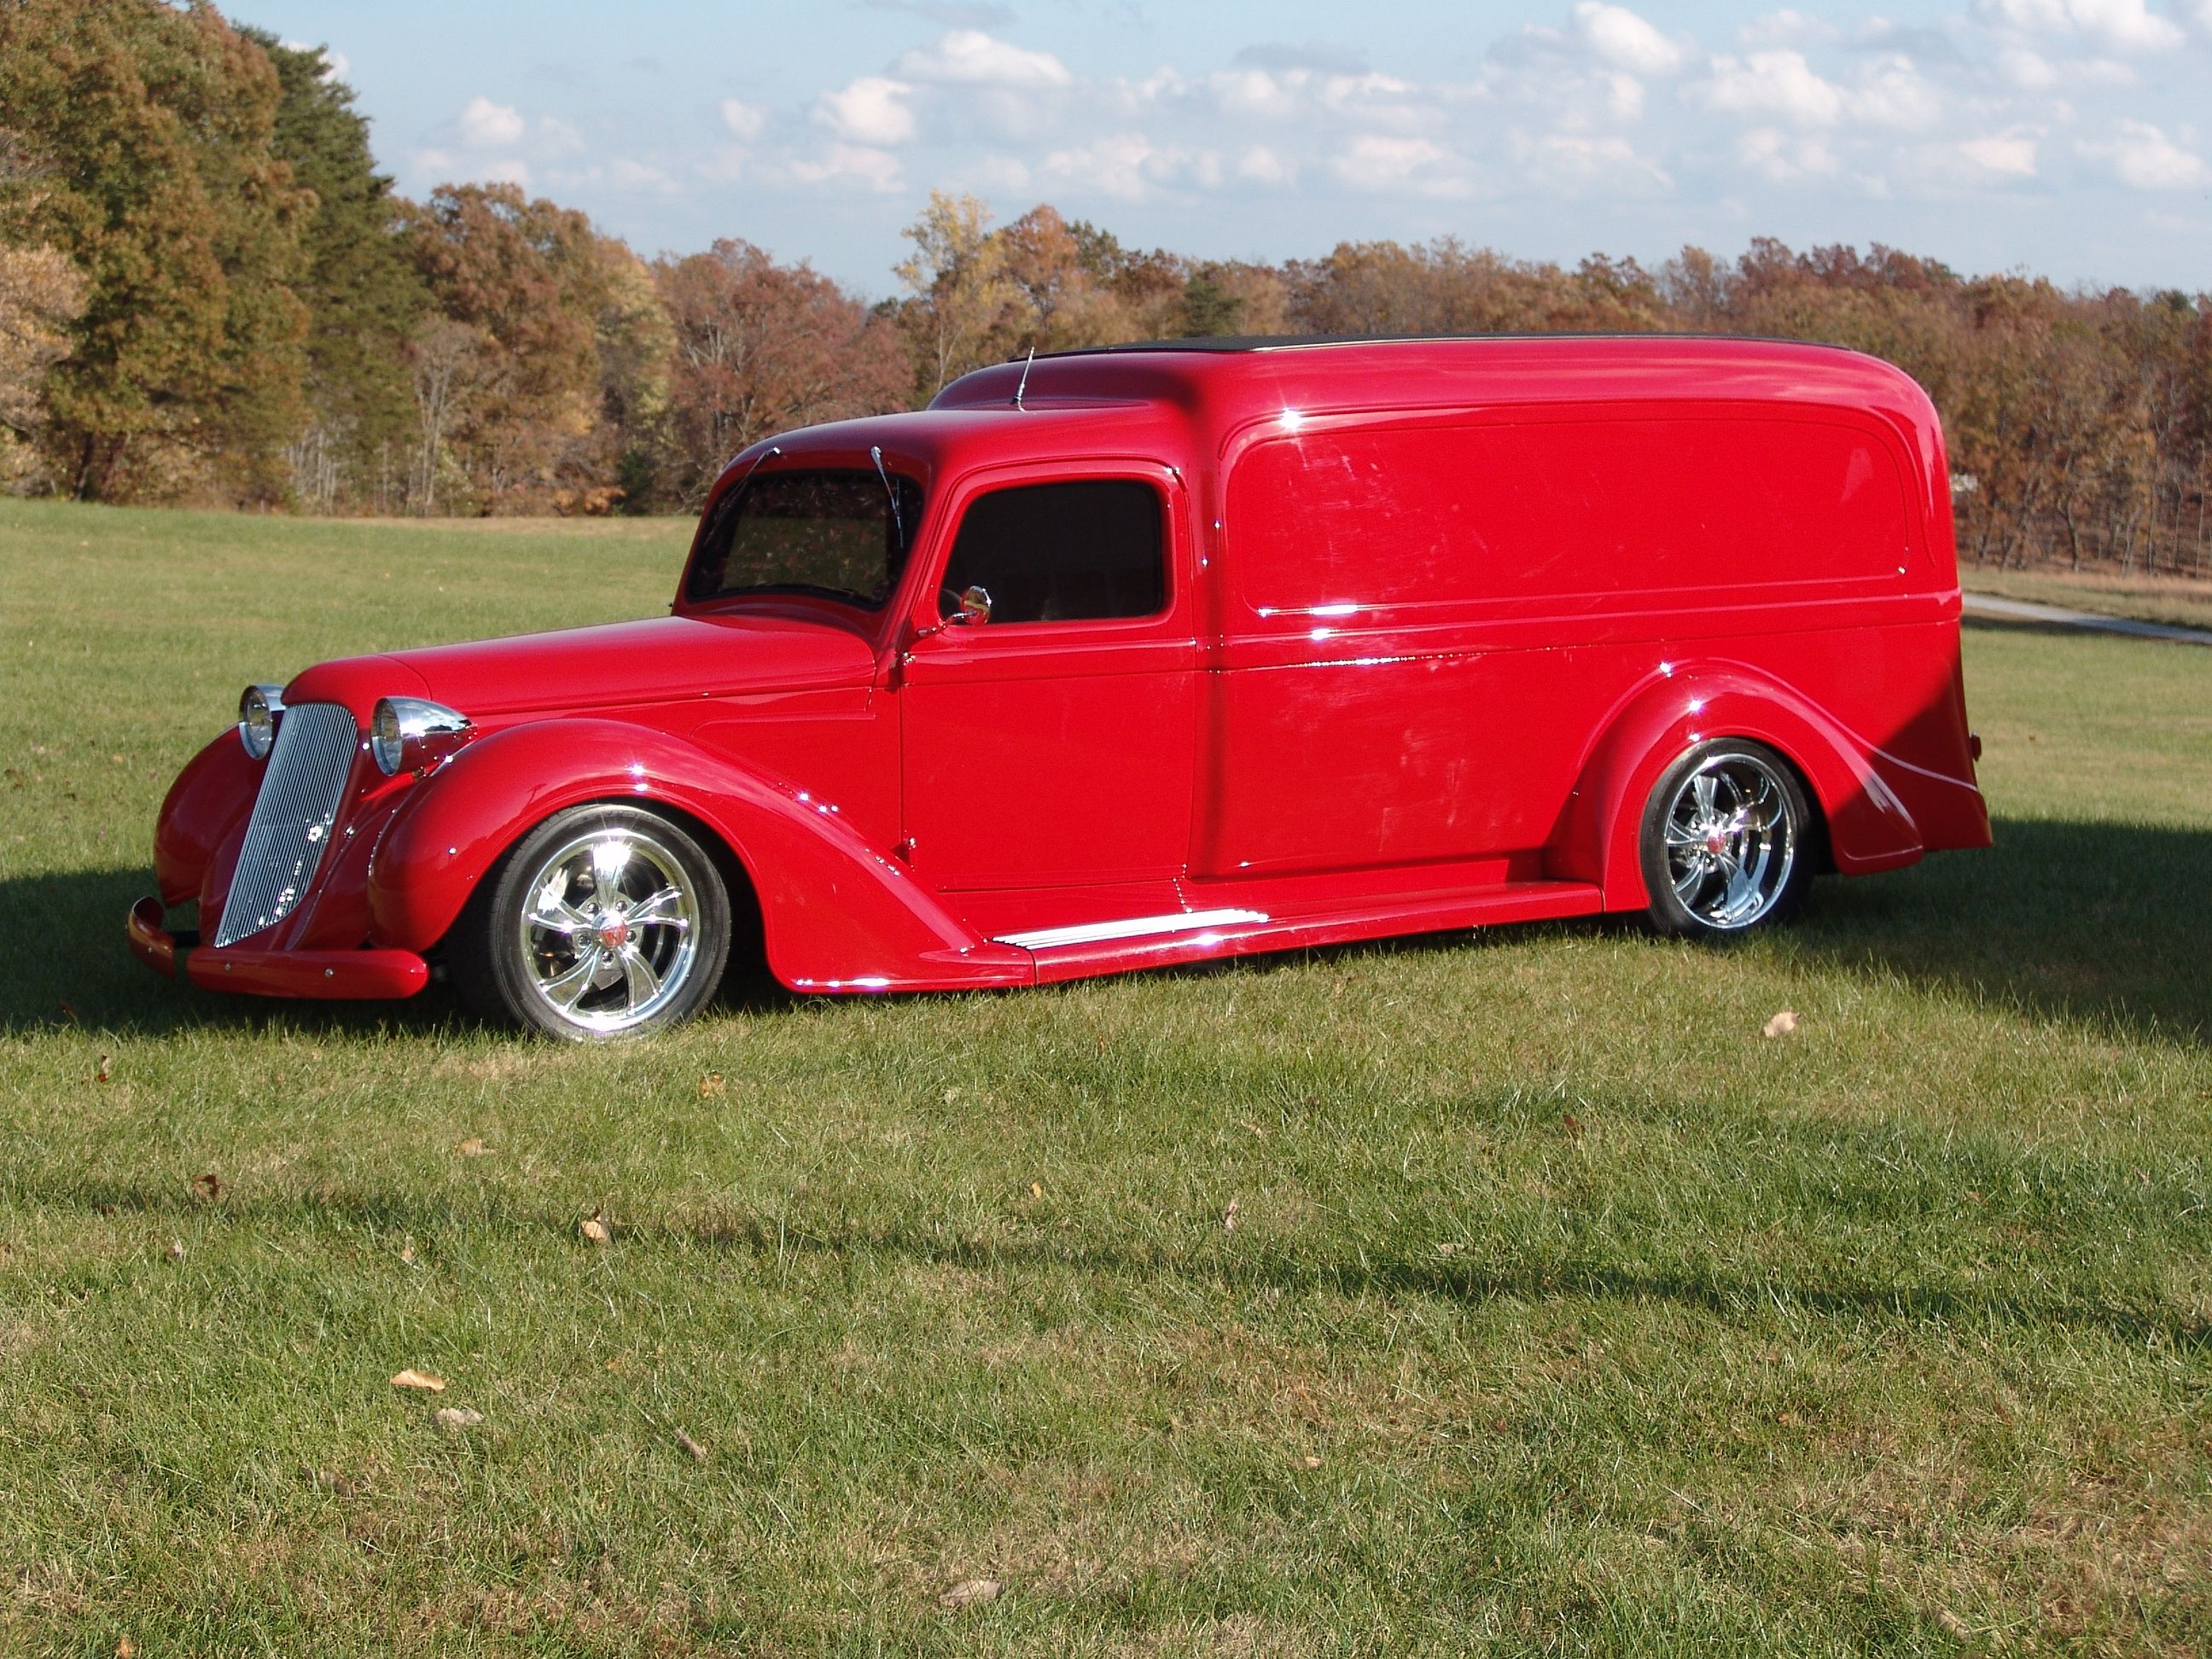 custom classic cars | ... Car wallpapers1936 Dodge panel truck ...